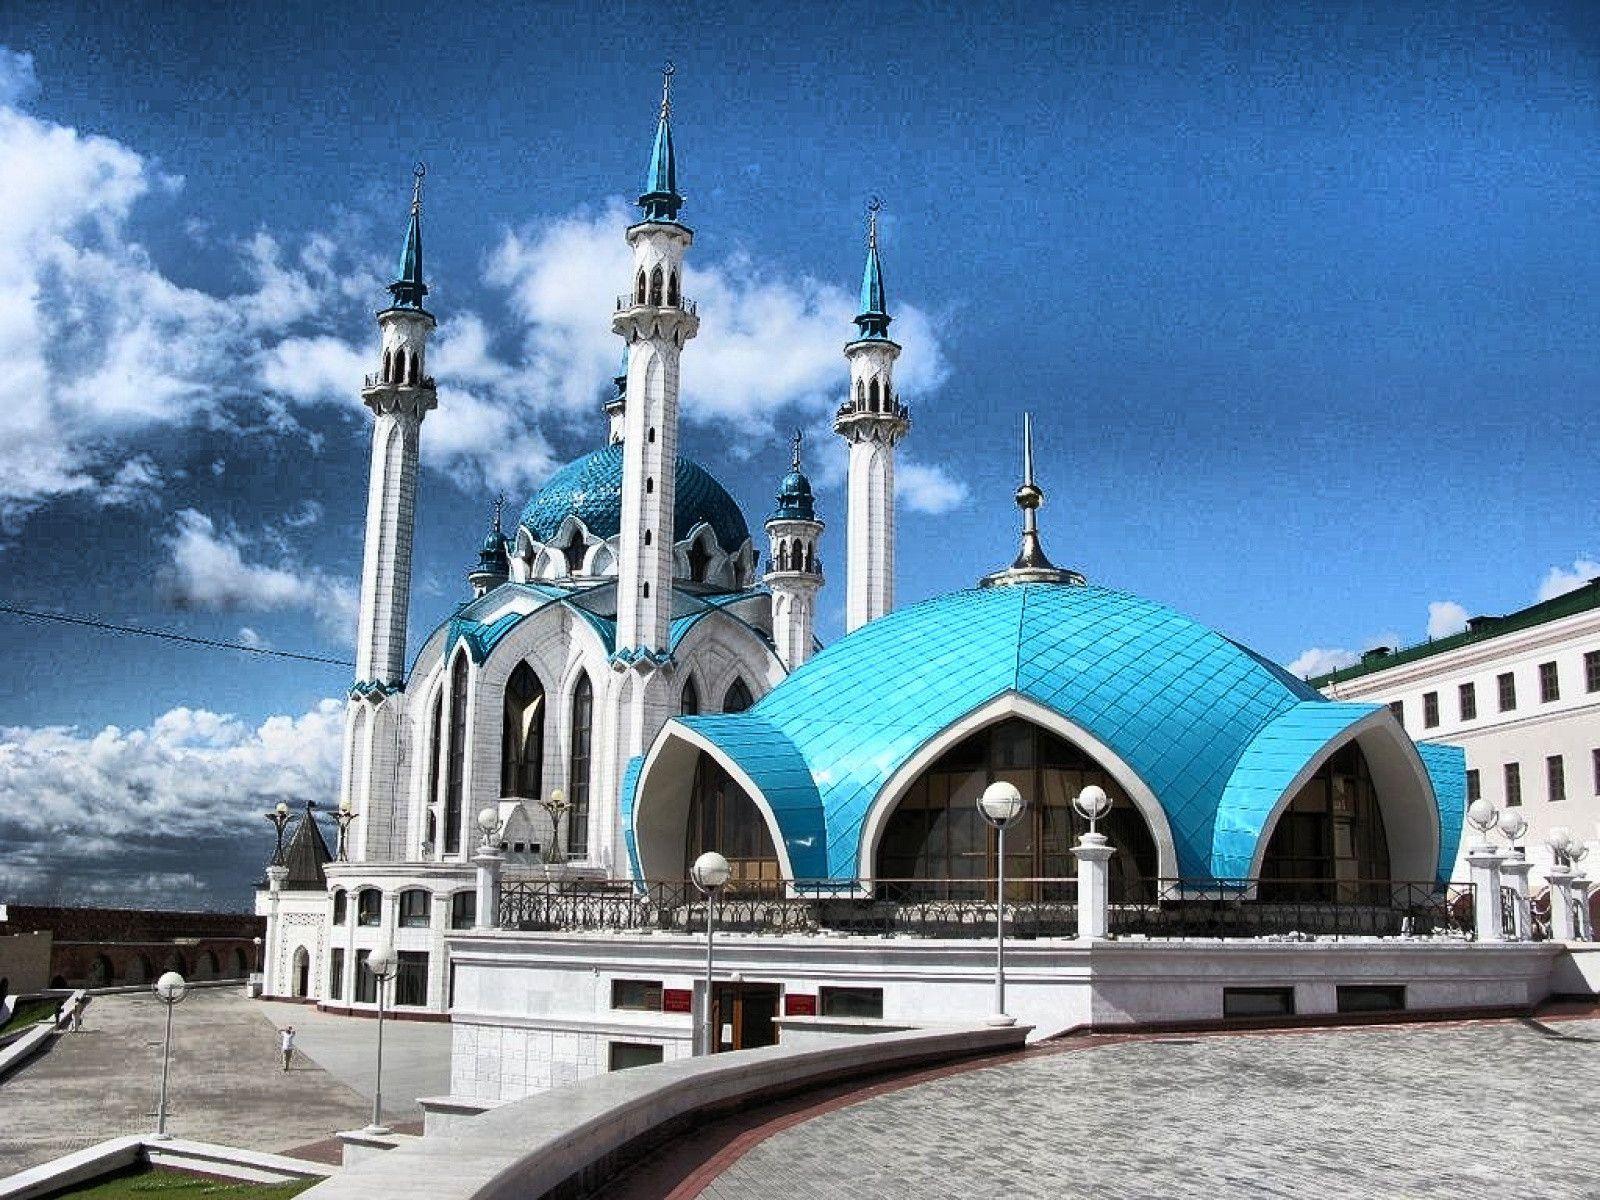 Download World Beautiful Mosque Wallpaper Gallery Kultovoe